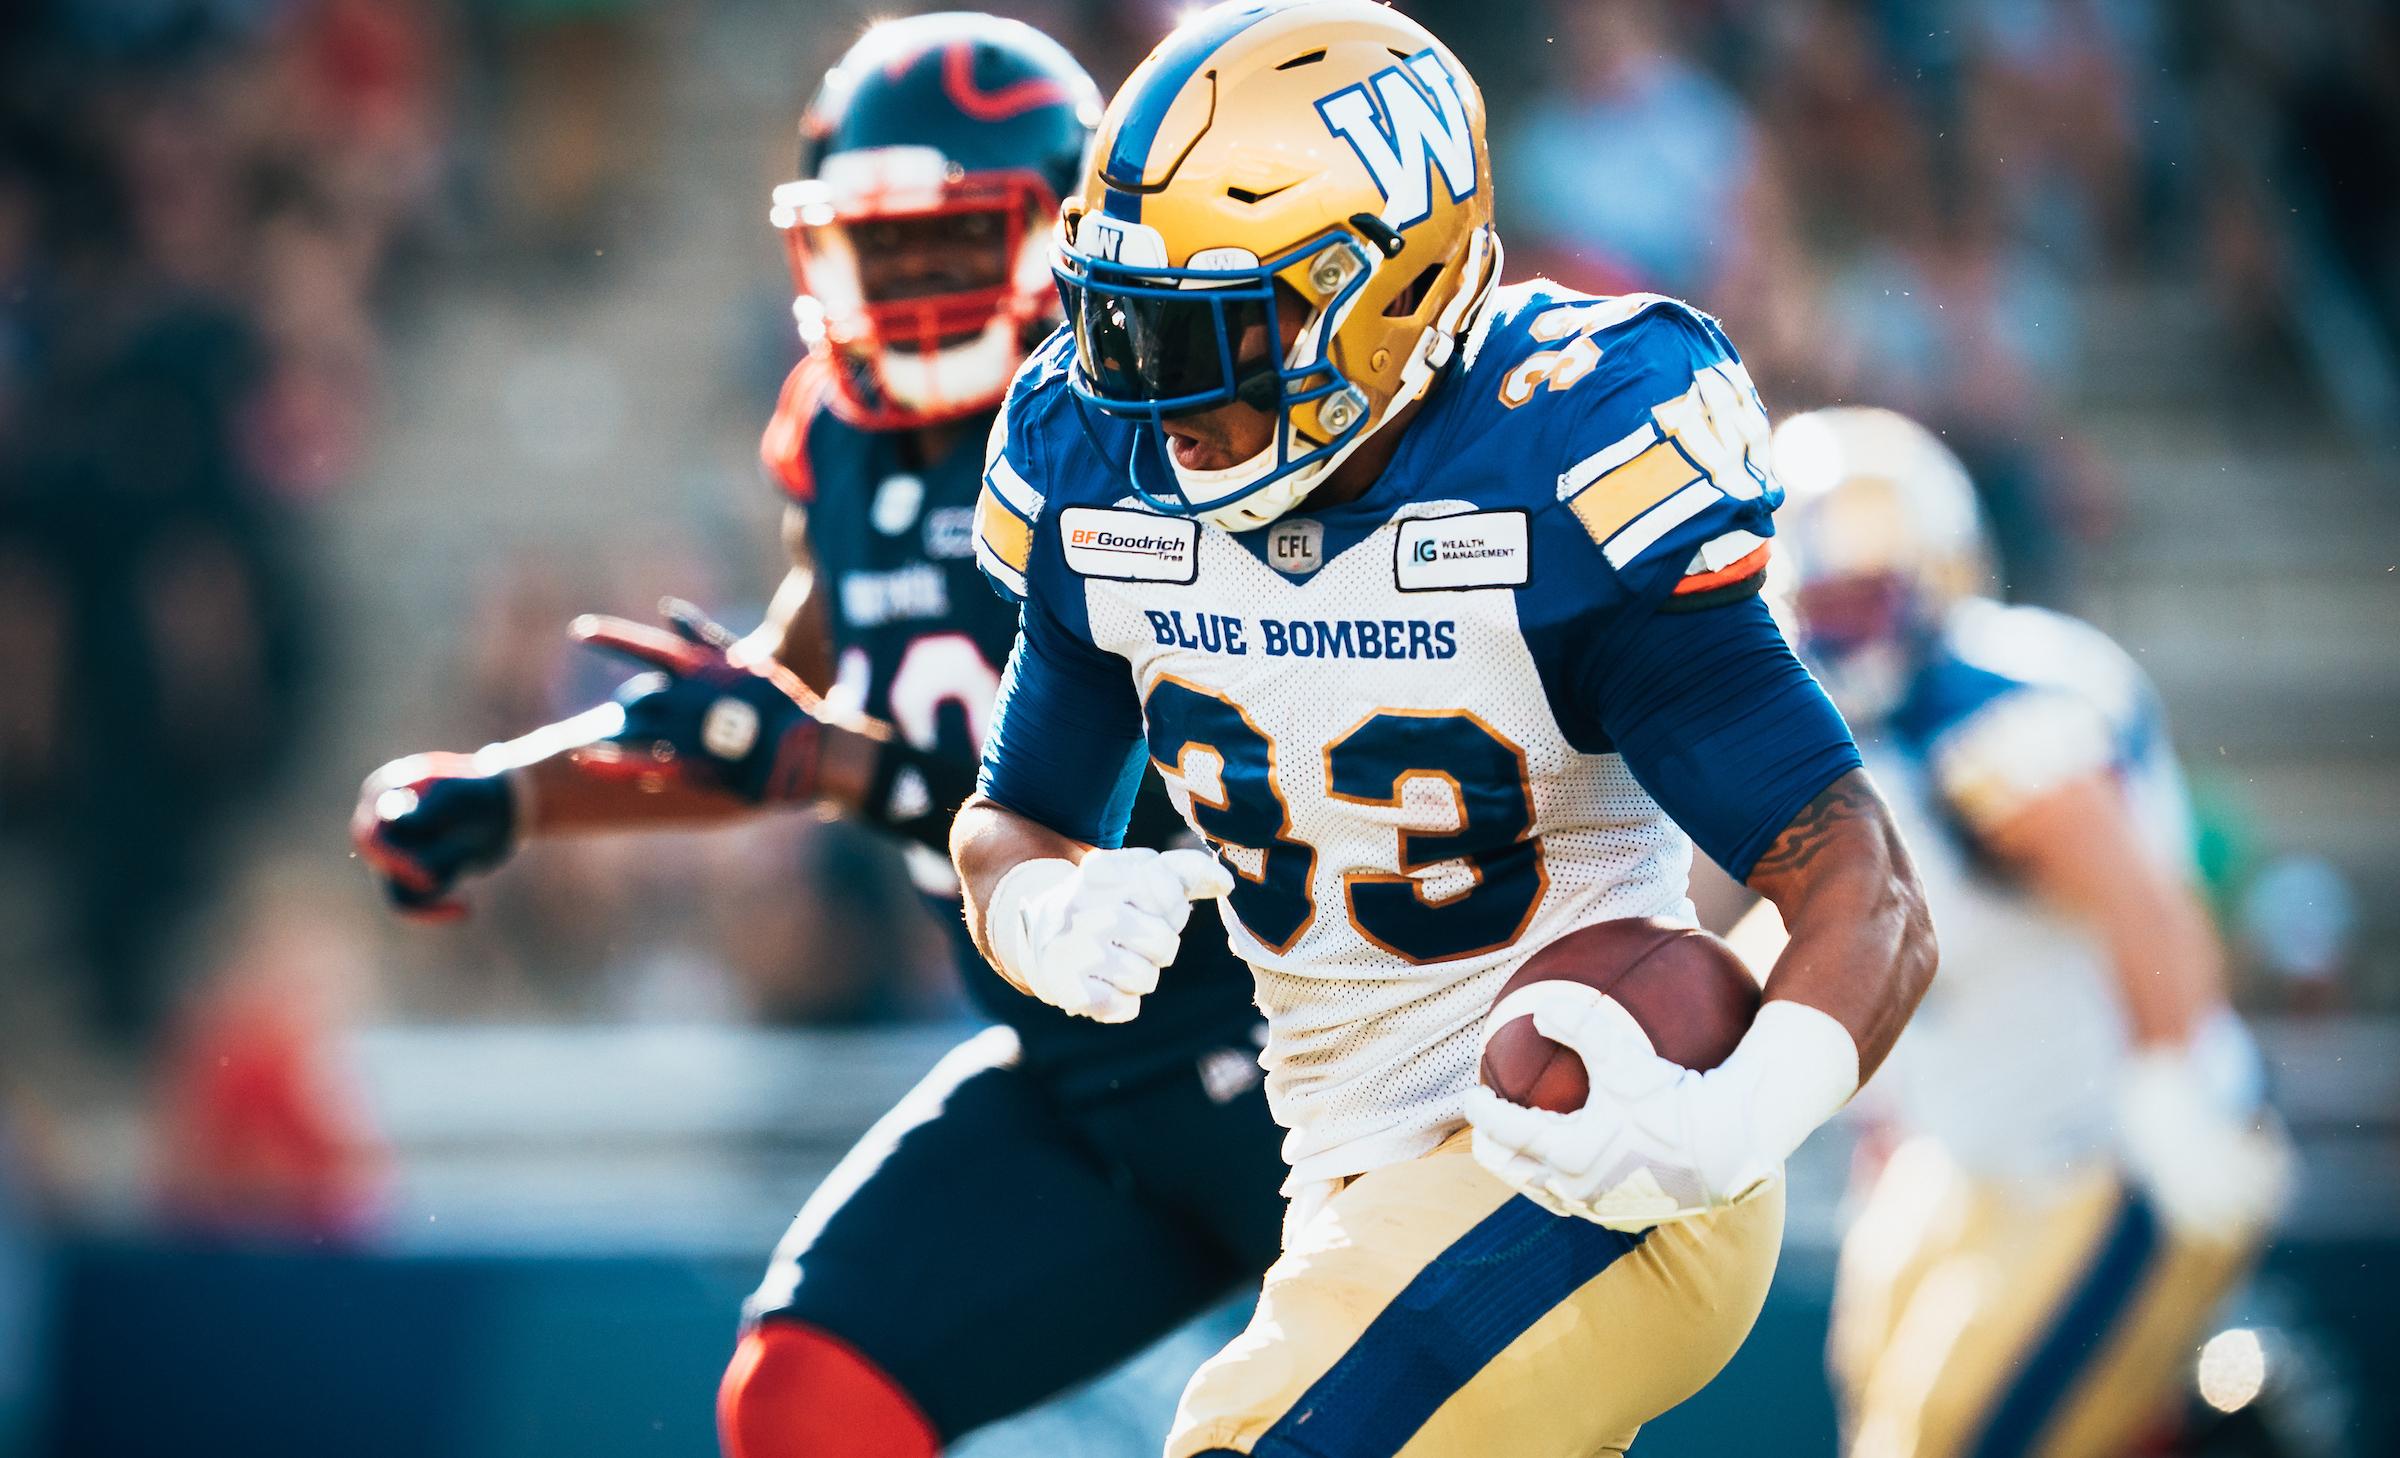 Game Recap | WPG 37 MTL 38 - Winnipeg Blue Bombers